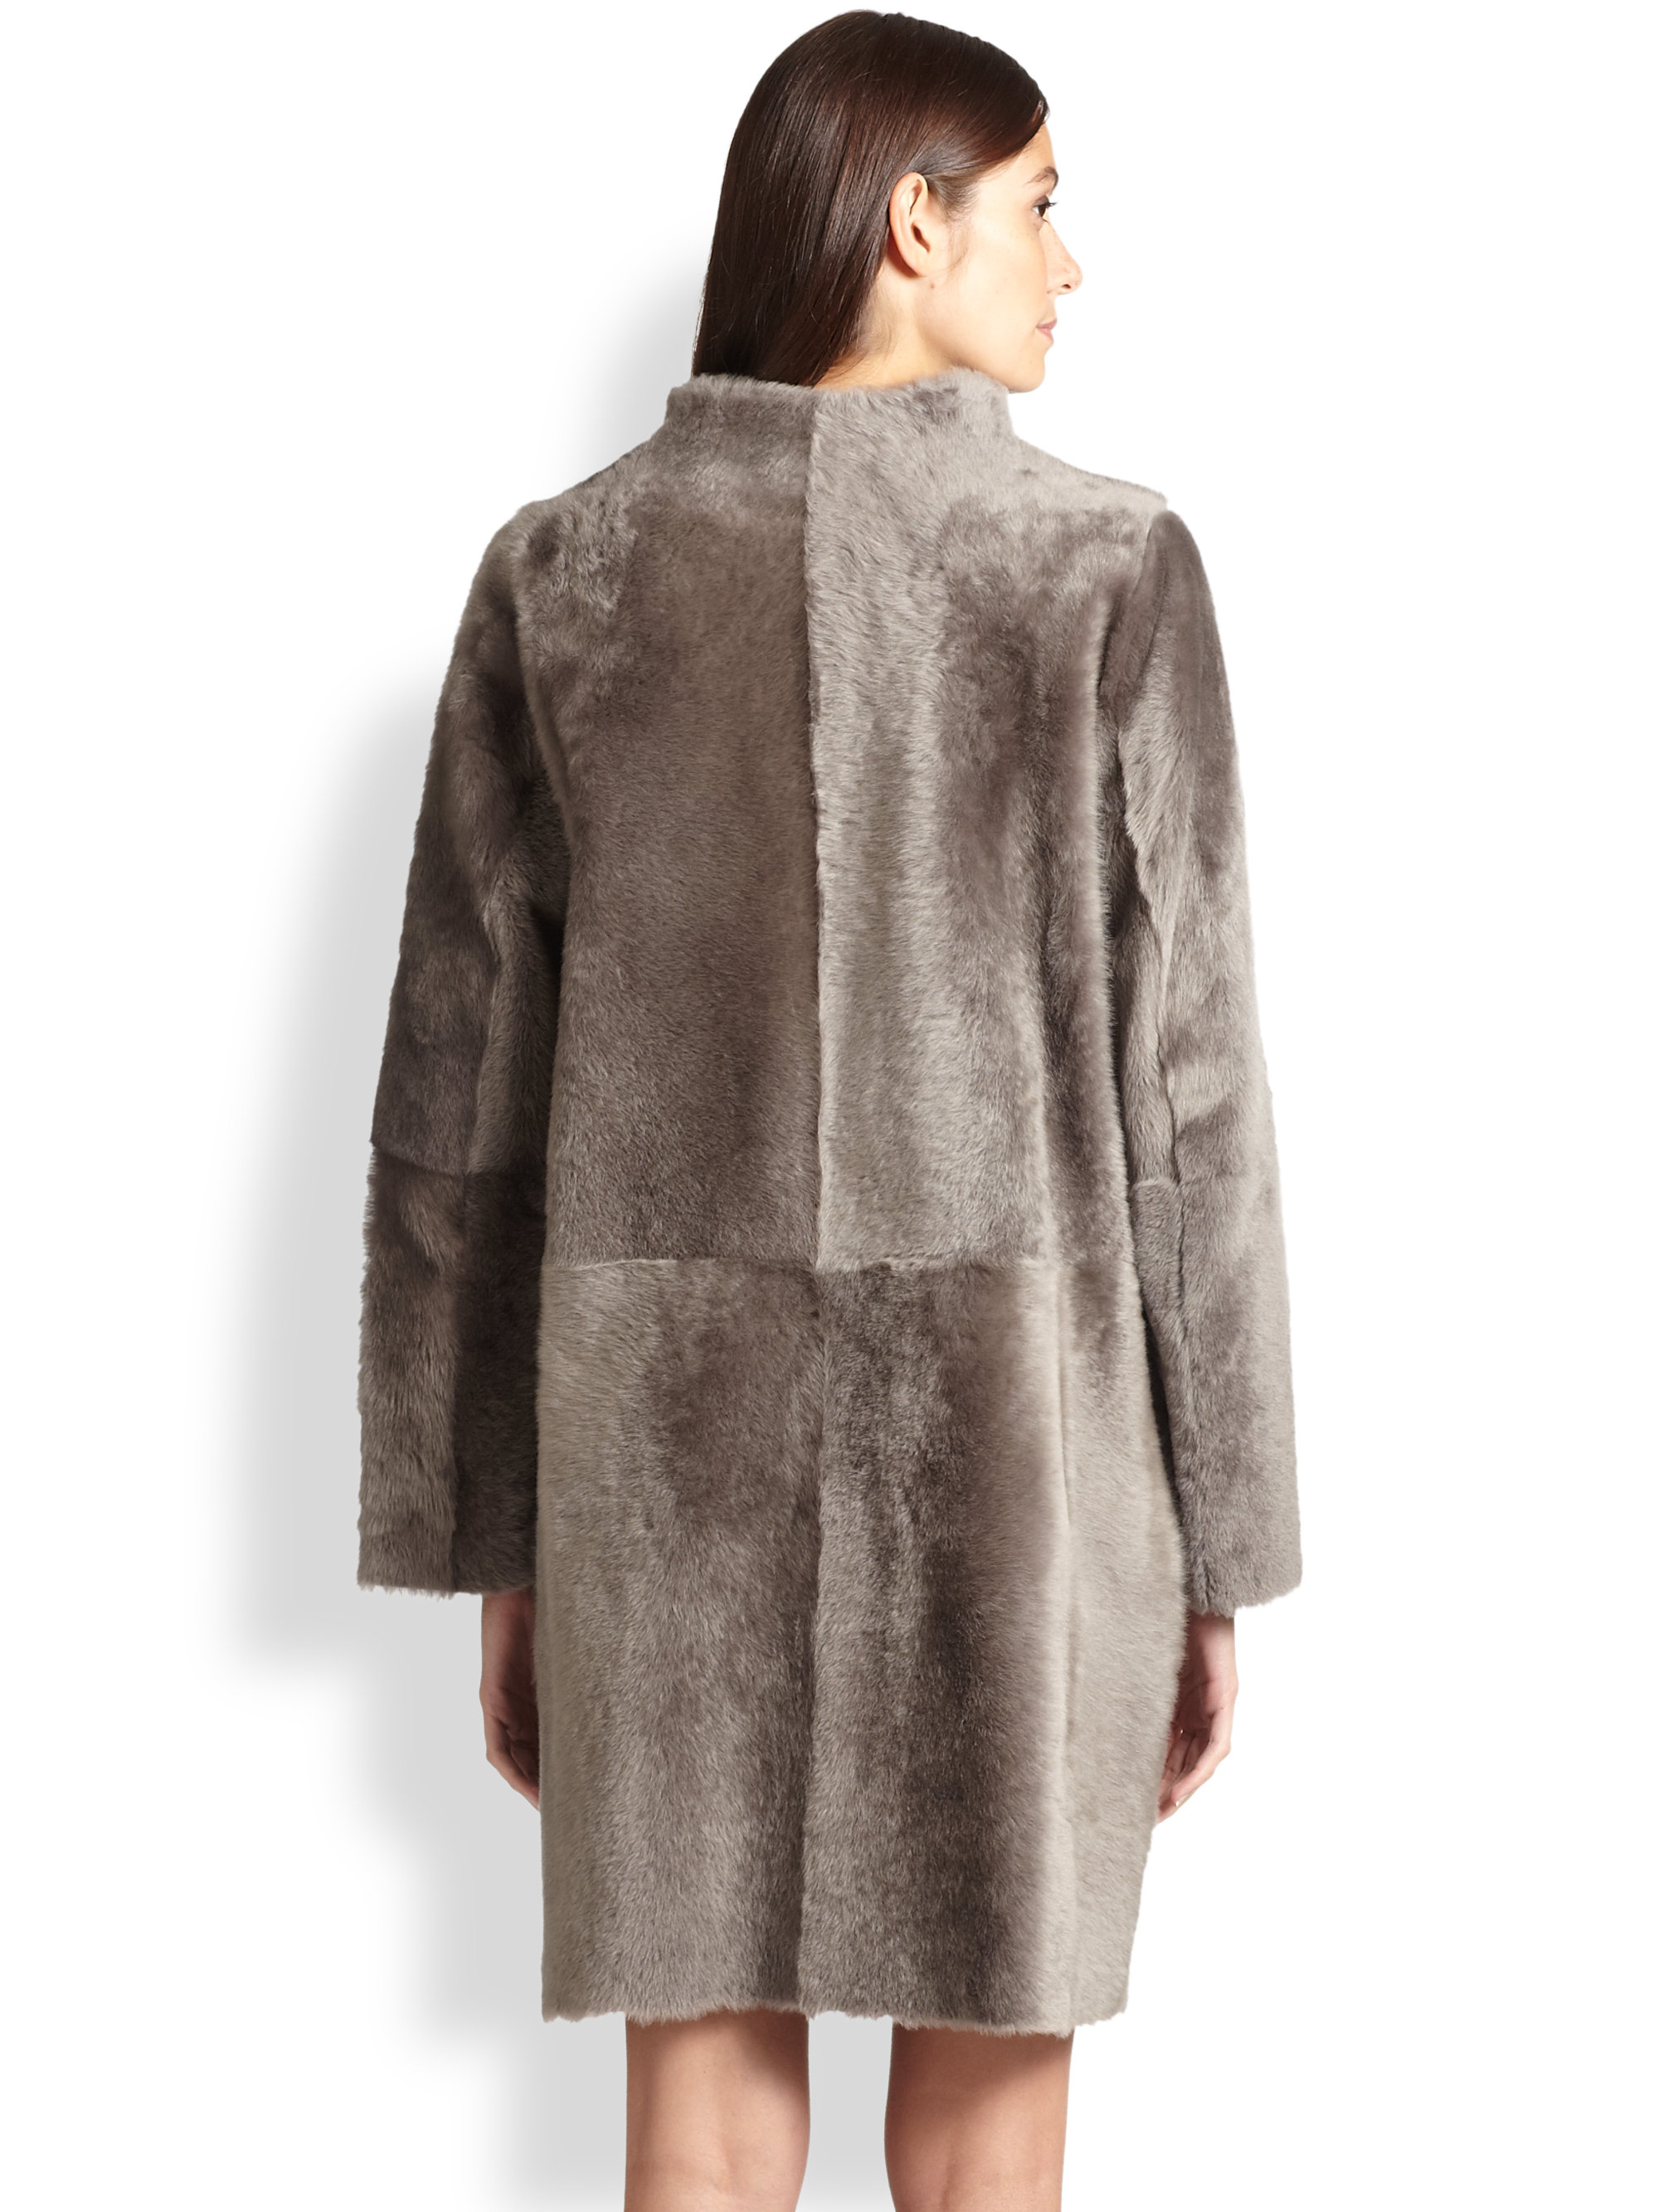 Max mara Aletta Shearling Coat | Lyst